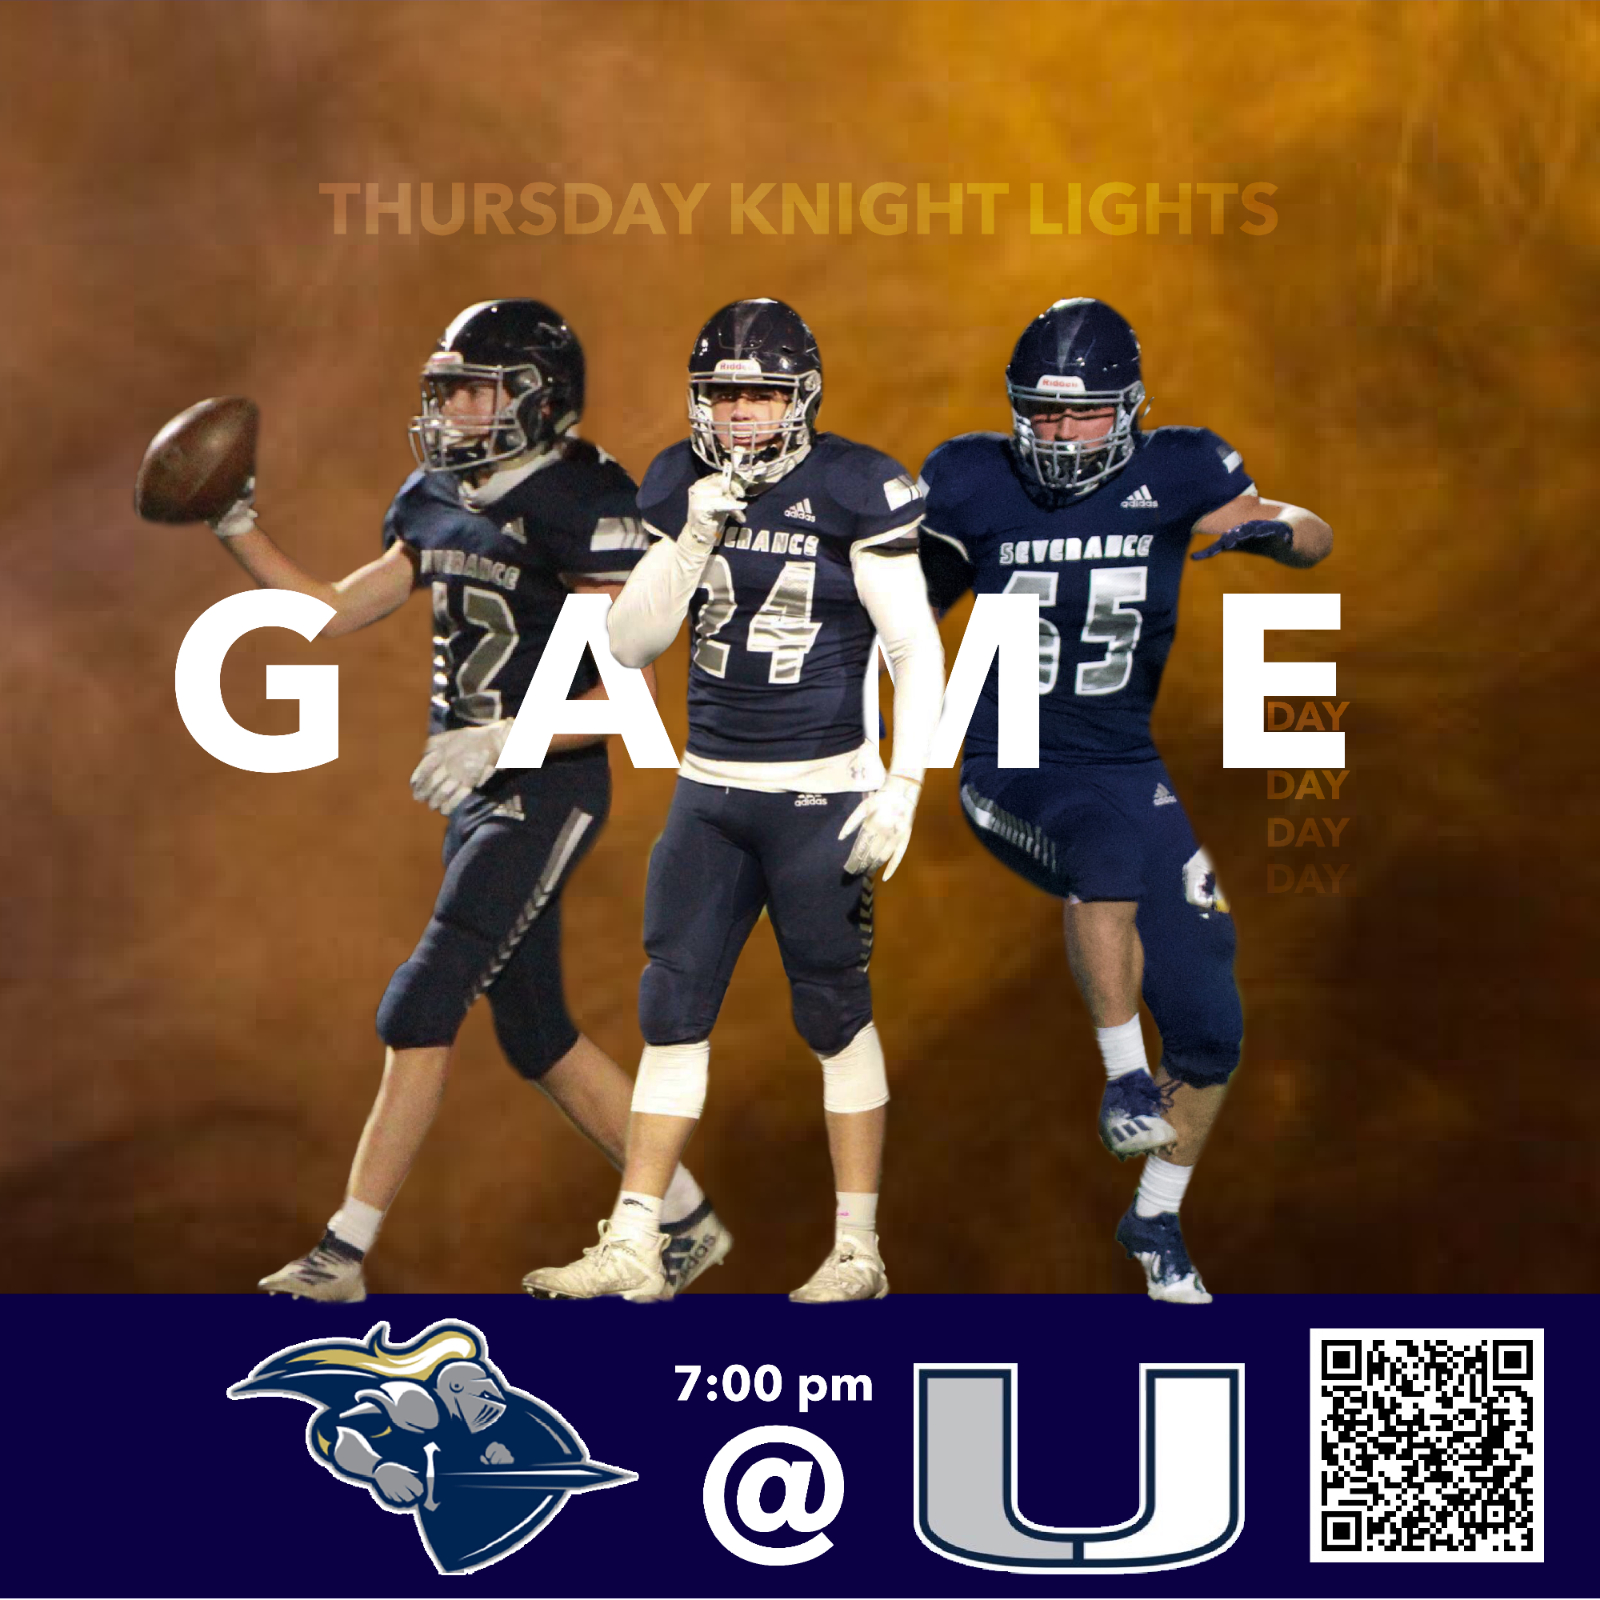 SHS Football VS University High School-Live Streaming Option Available